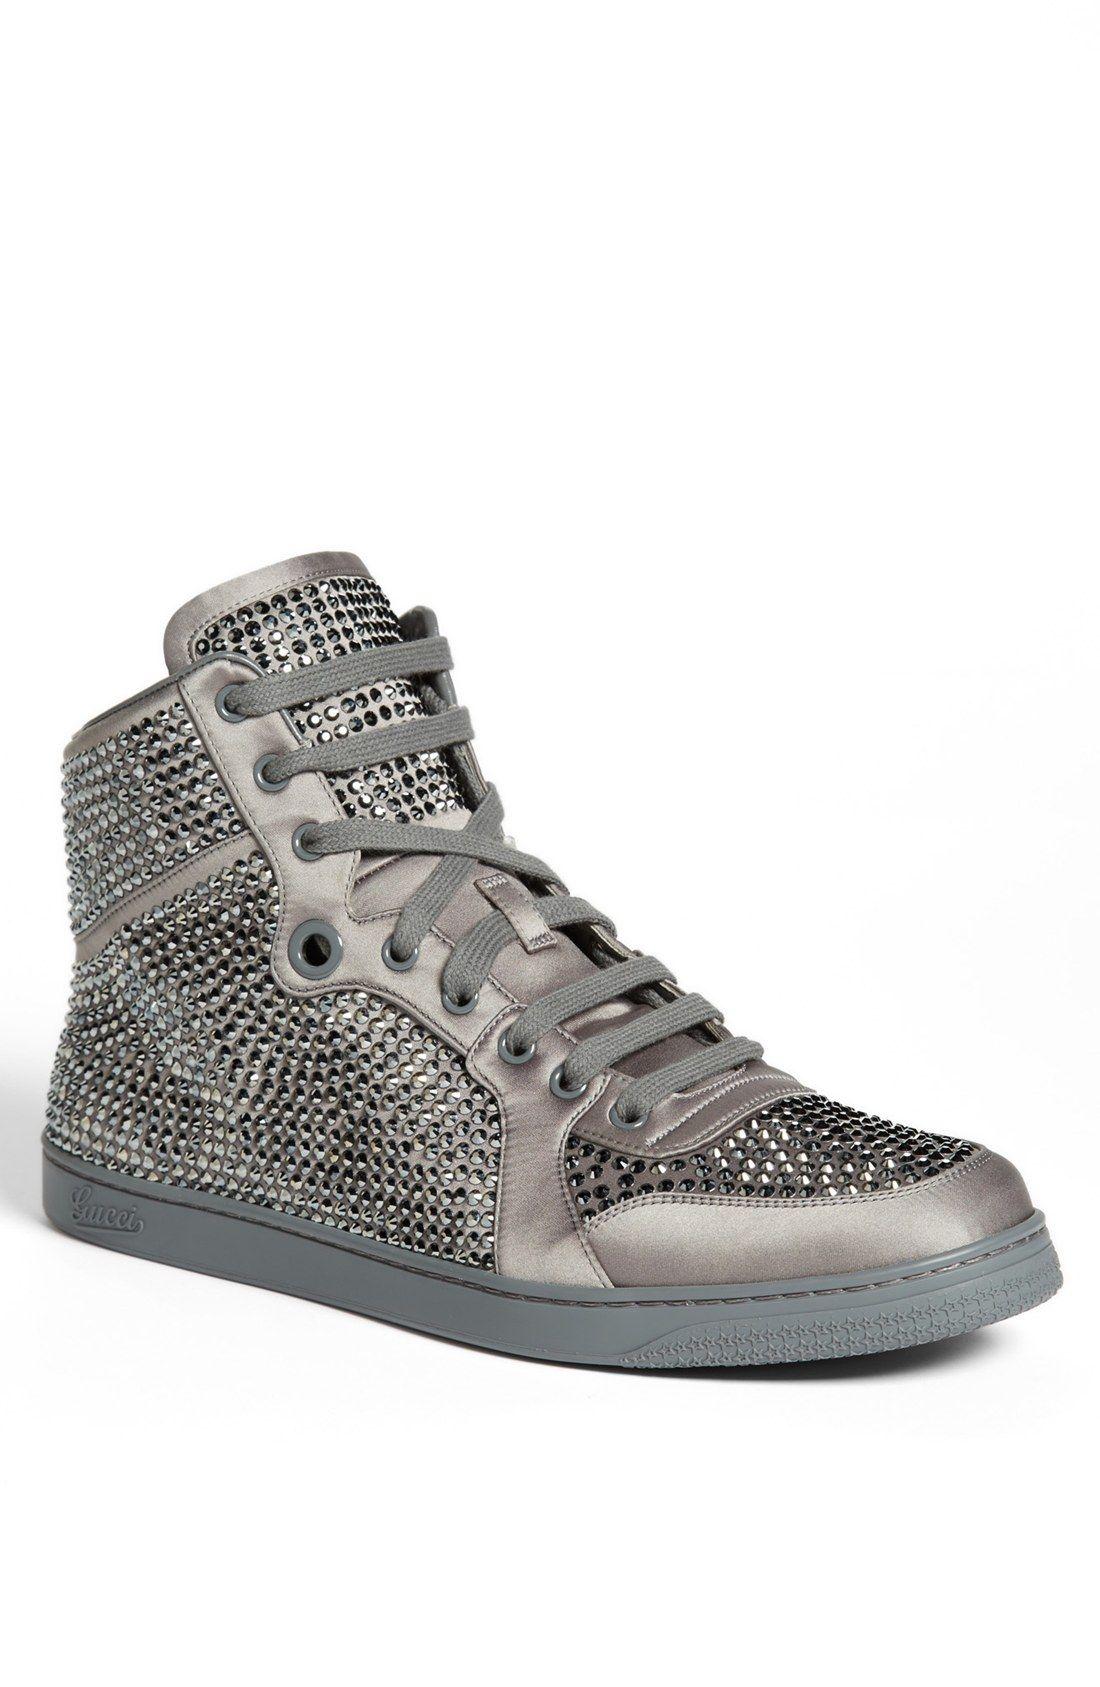 0cfd4524f7a coda sneakers men